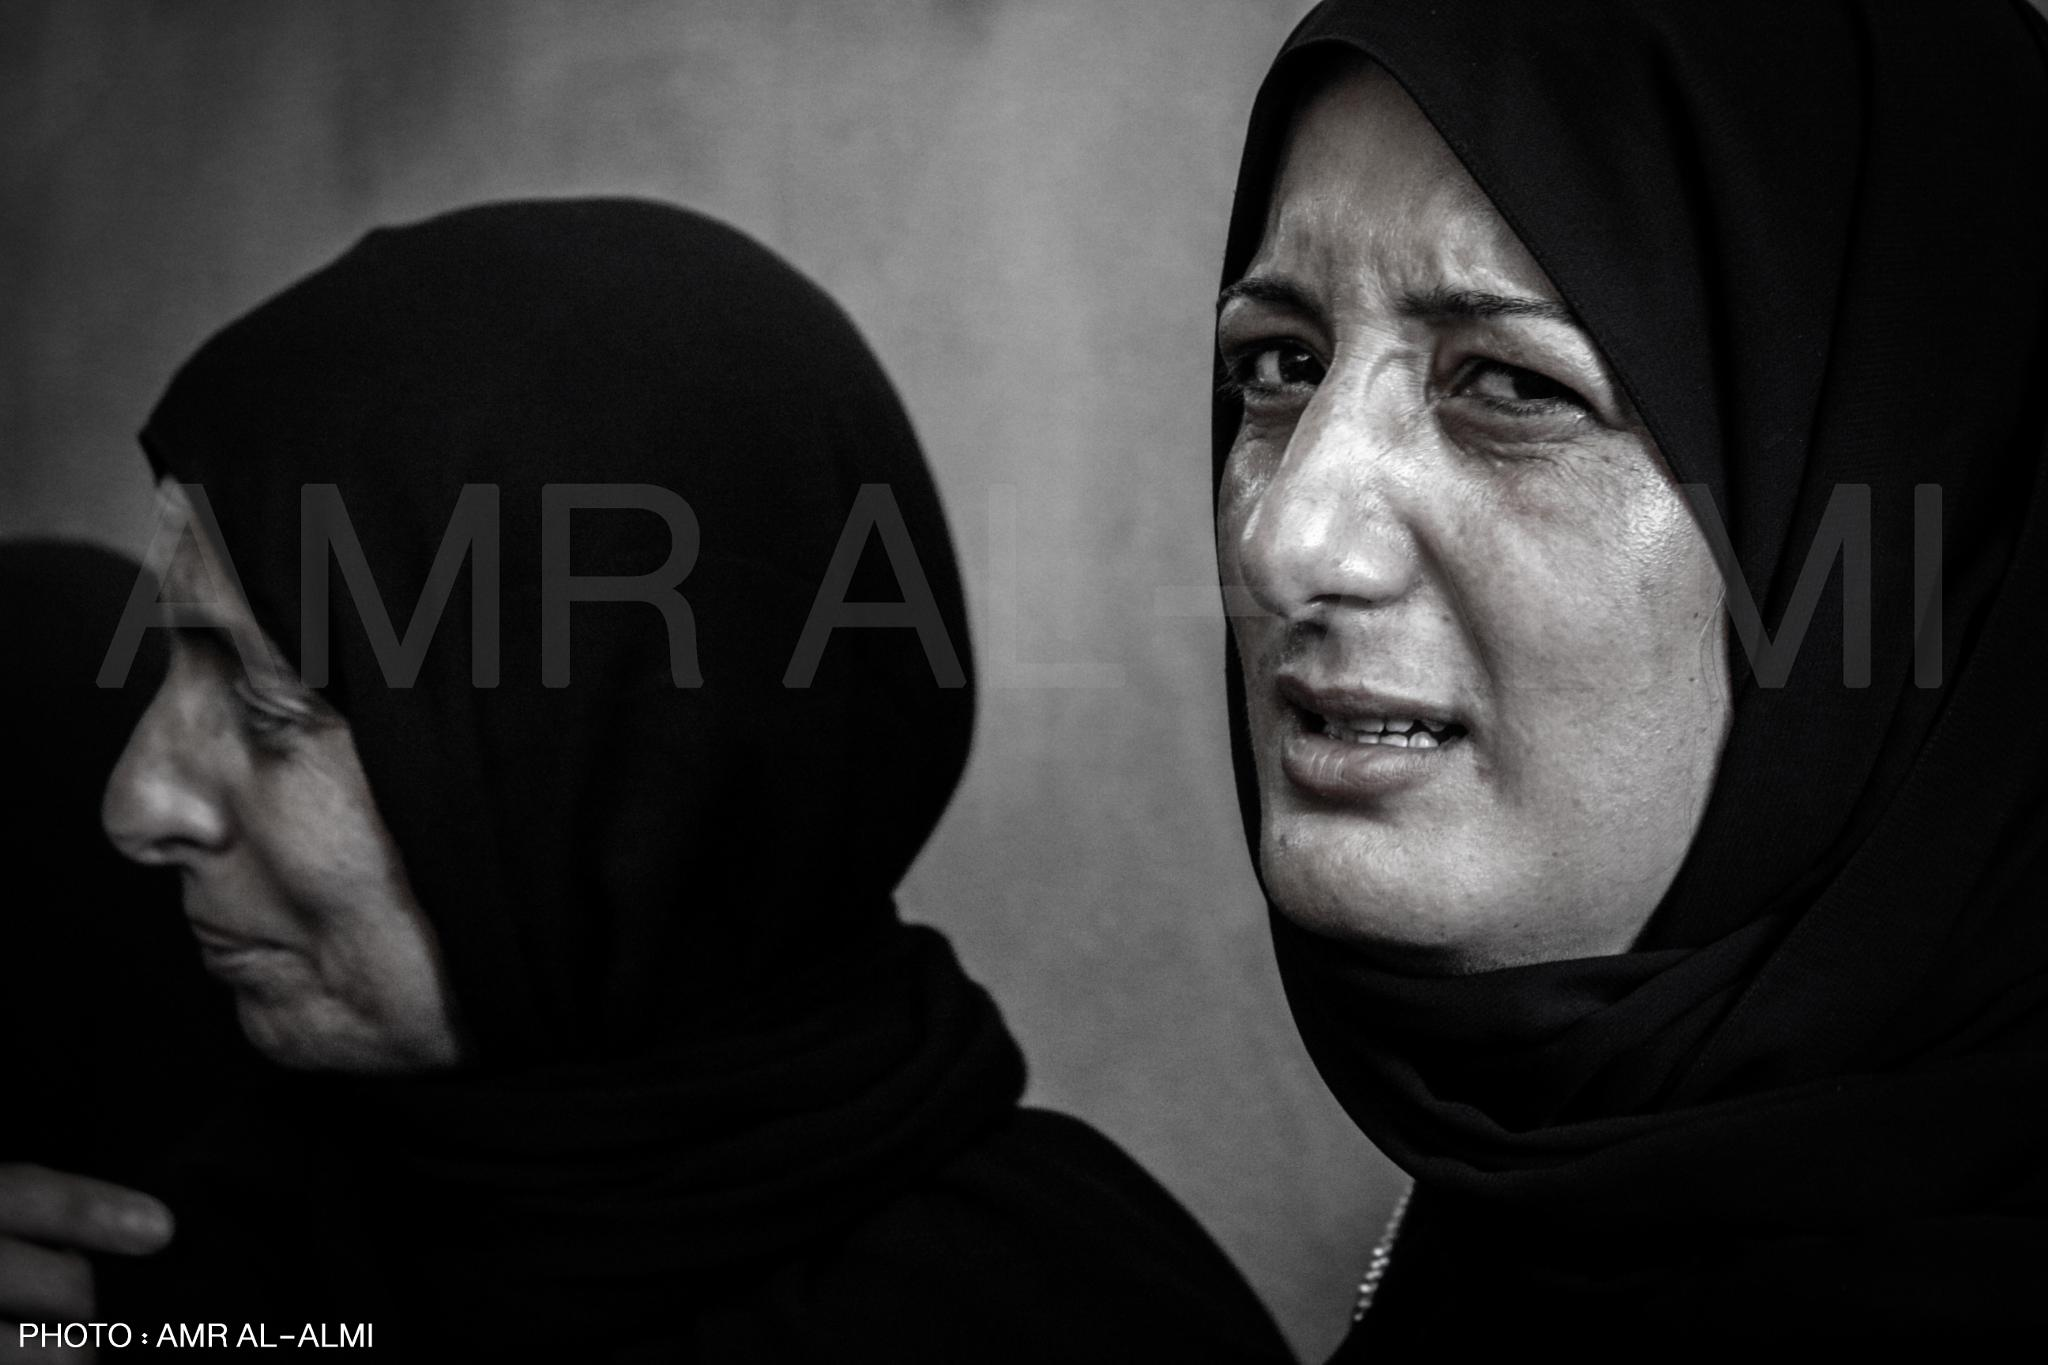 Untitled by Amr Al-almi